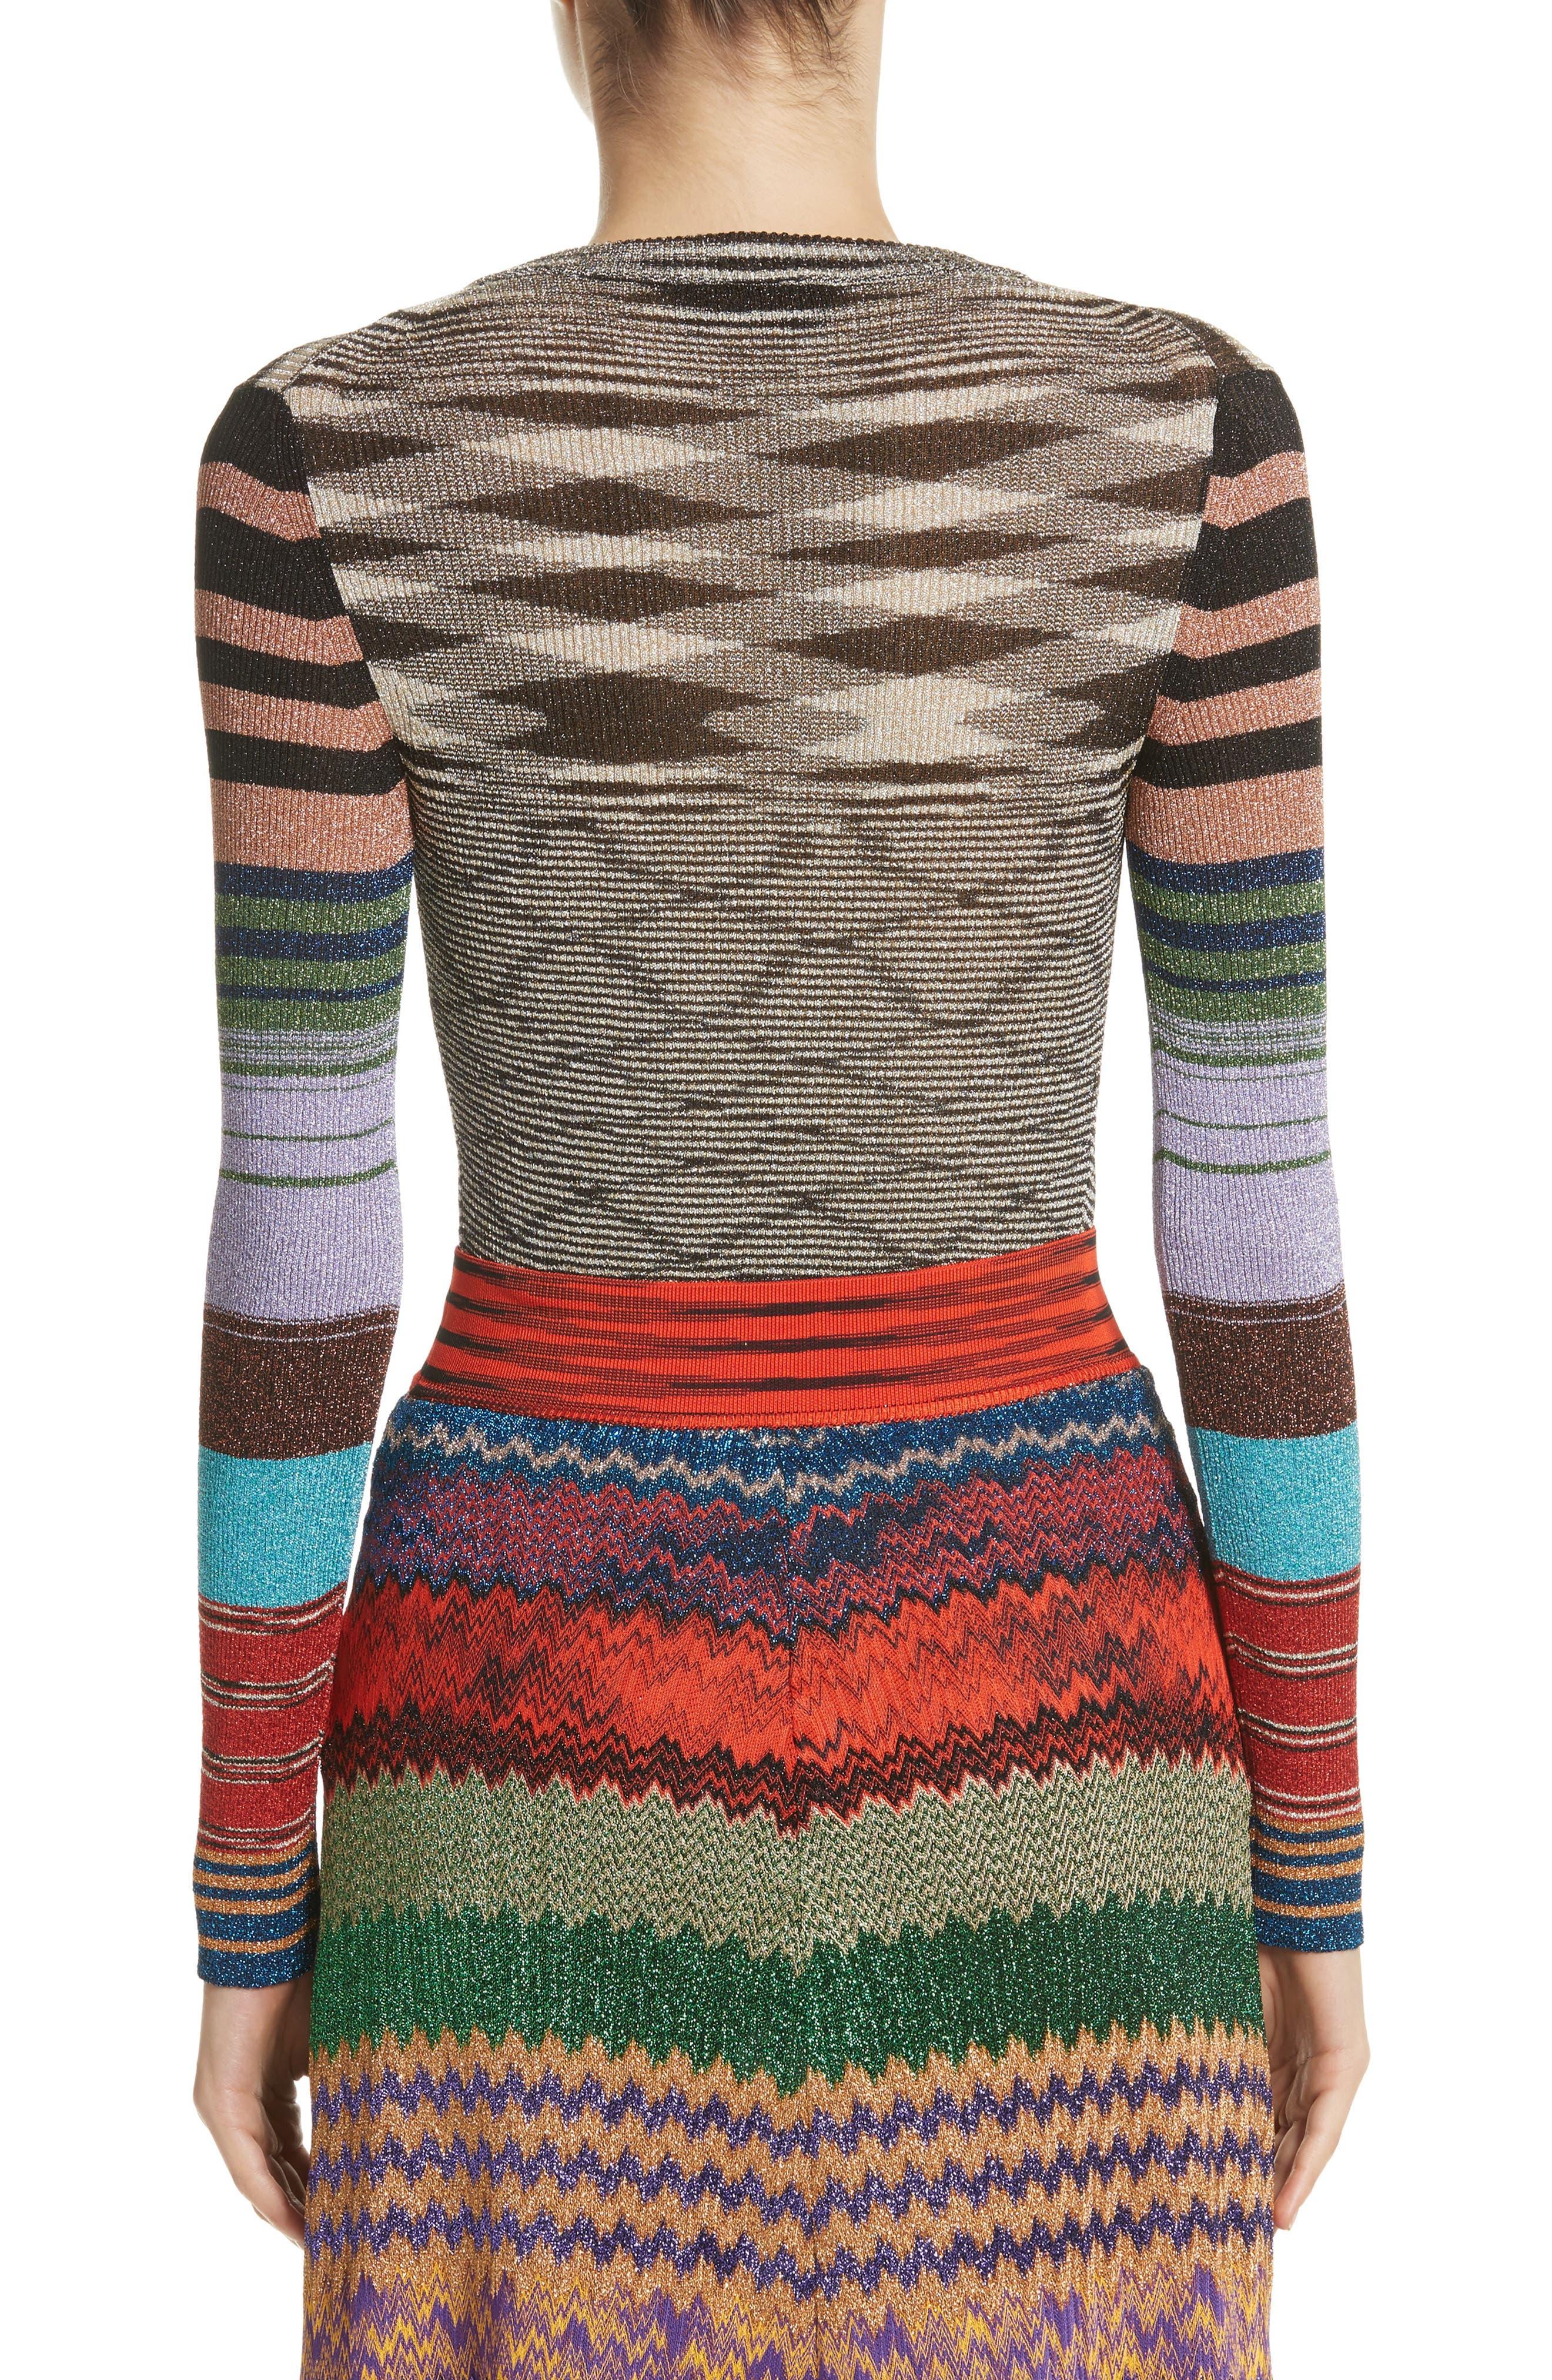 Metallic Space Dye Knit Sweater,                             Alternate thumbnail 2, color,                             Multi